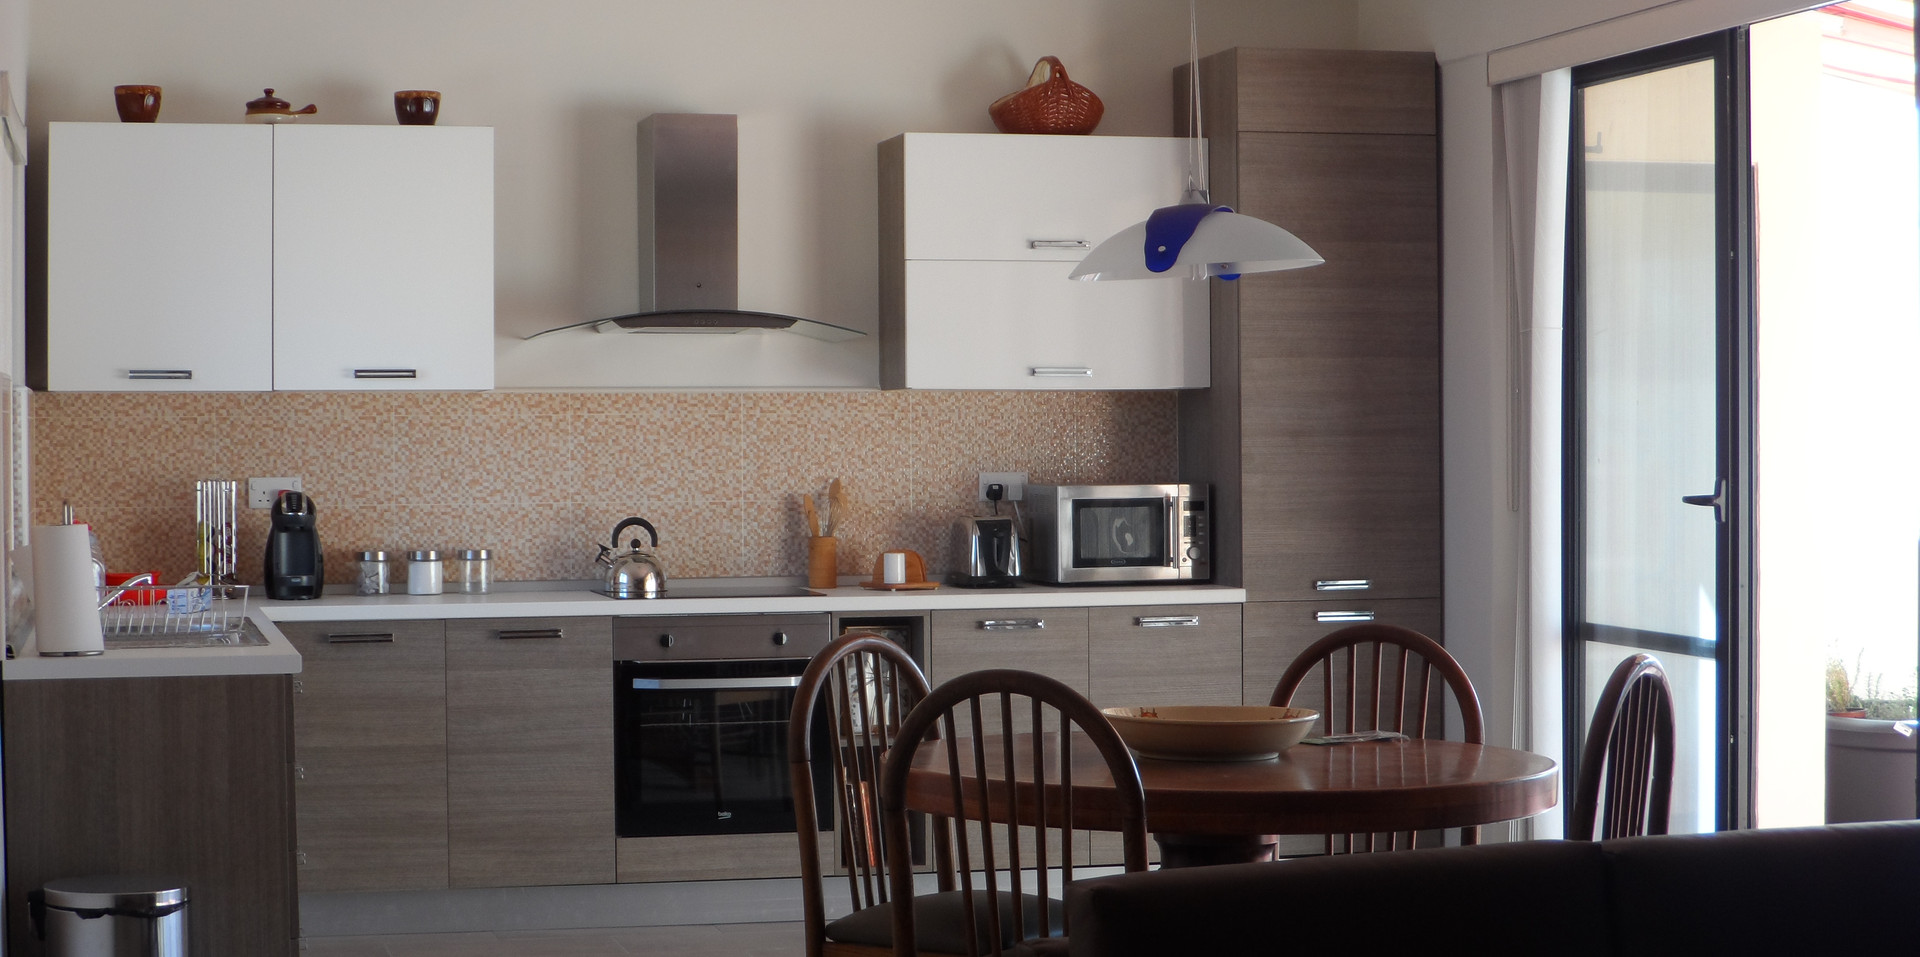 35 - Living Dining Kitchen 1.JPG